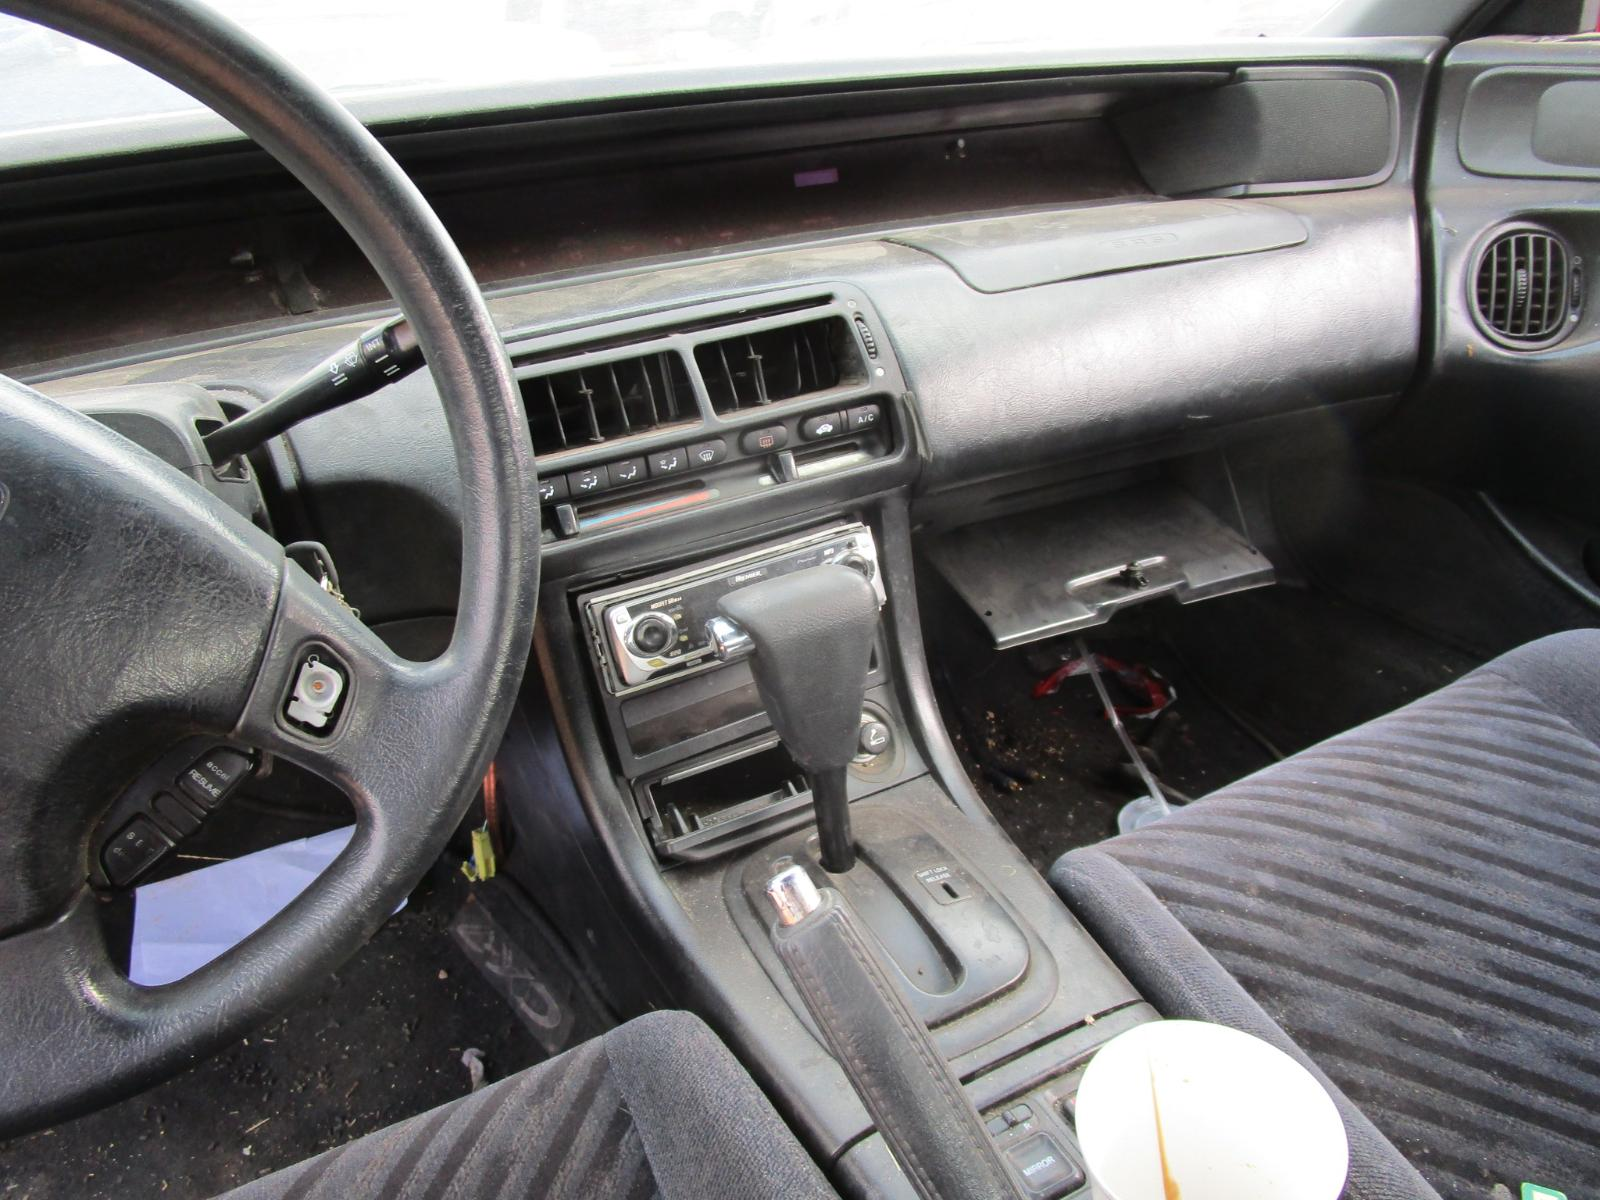 Honda Prelude Rear Upper Control Arm Used Auto Parts Daewoo Espero Illumination And Window Defroster Wiring 76ec3aa3 5f87 4f99 A4e0 5666303b4601